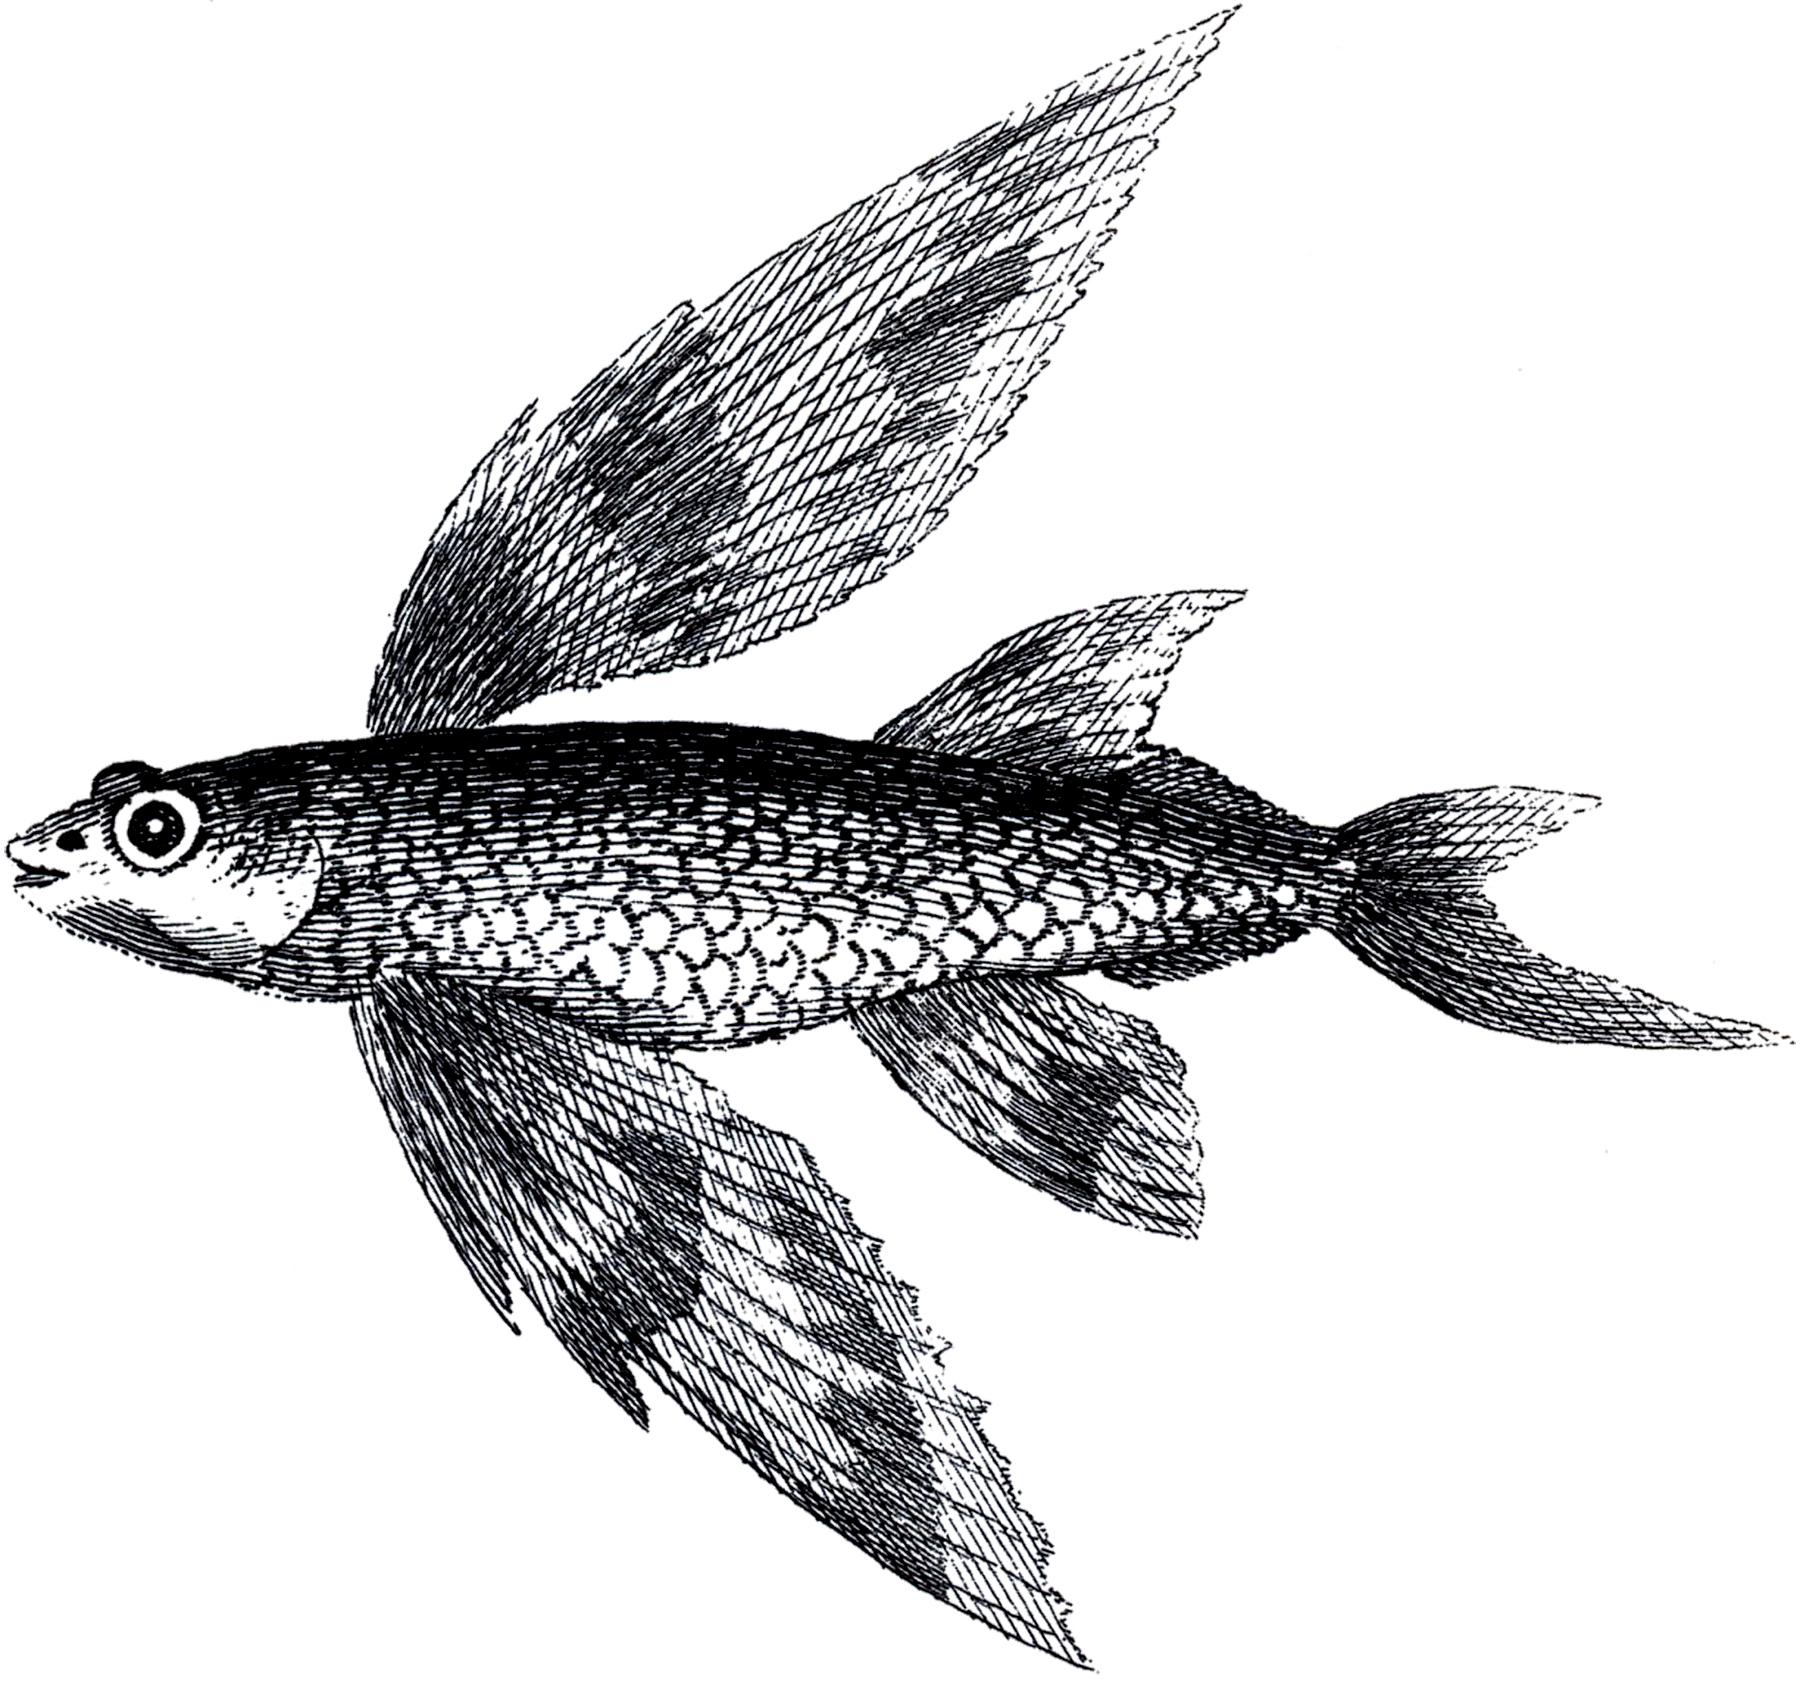 Vintage Flying Fish Image